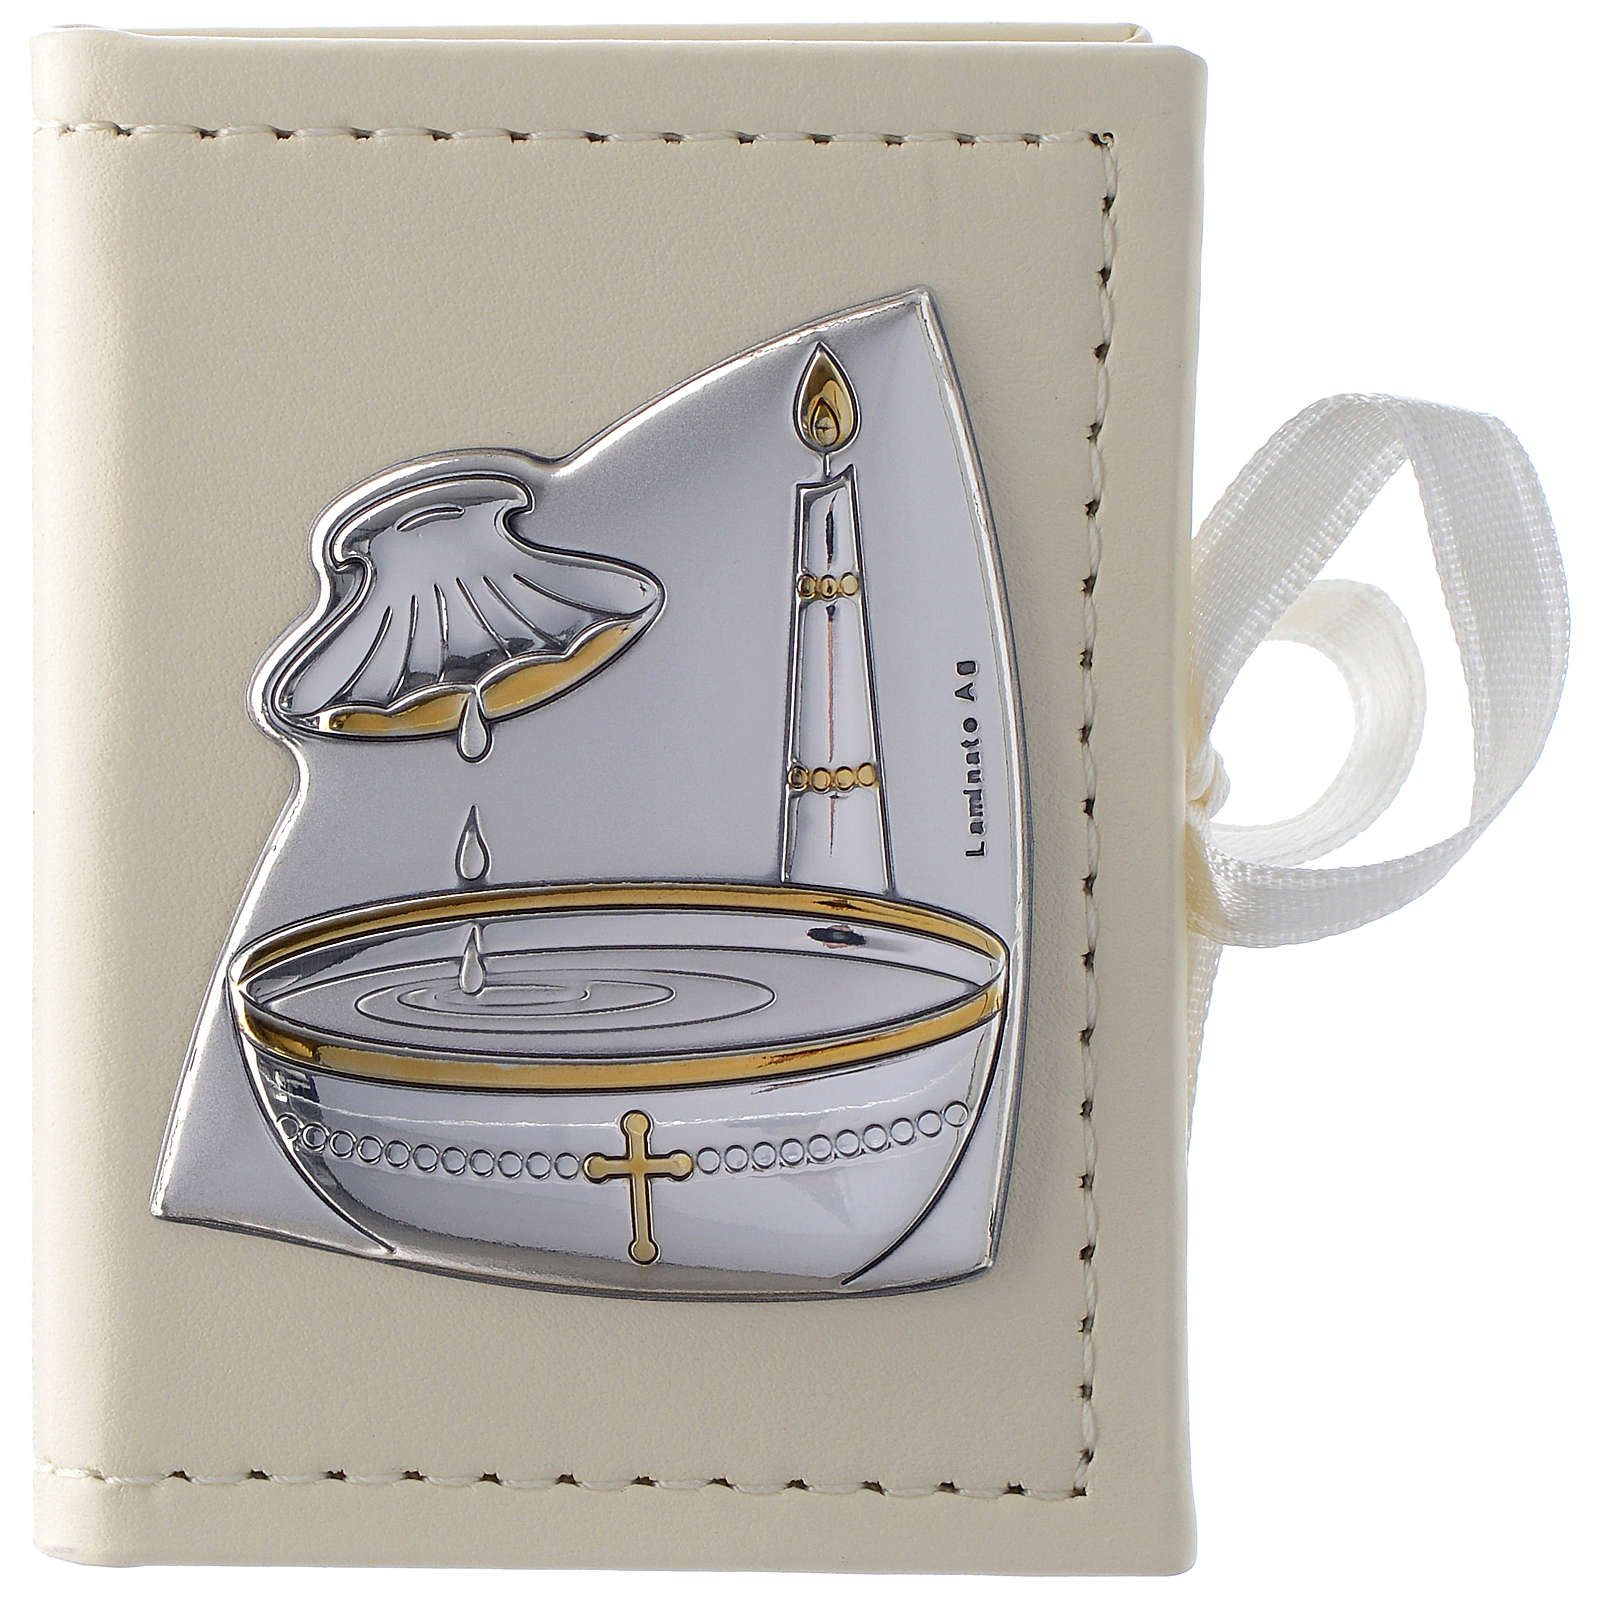 Caja para rosario Bautismo simil cuero e imagen bilaminado plata 3